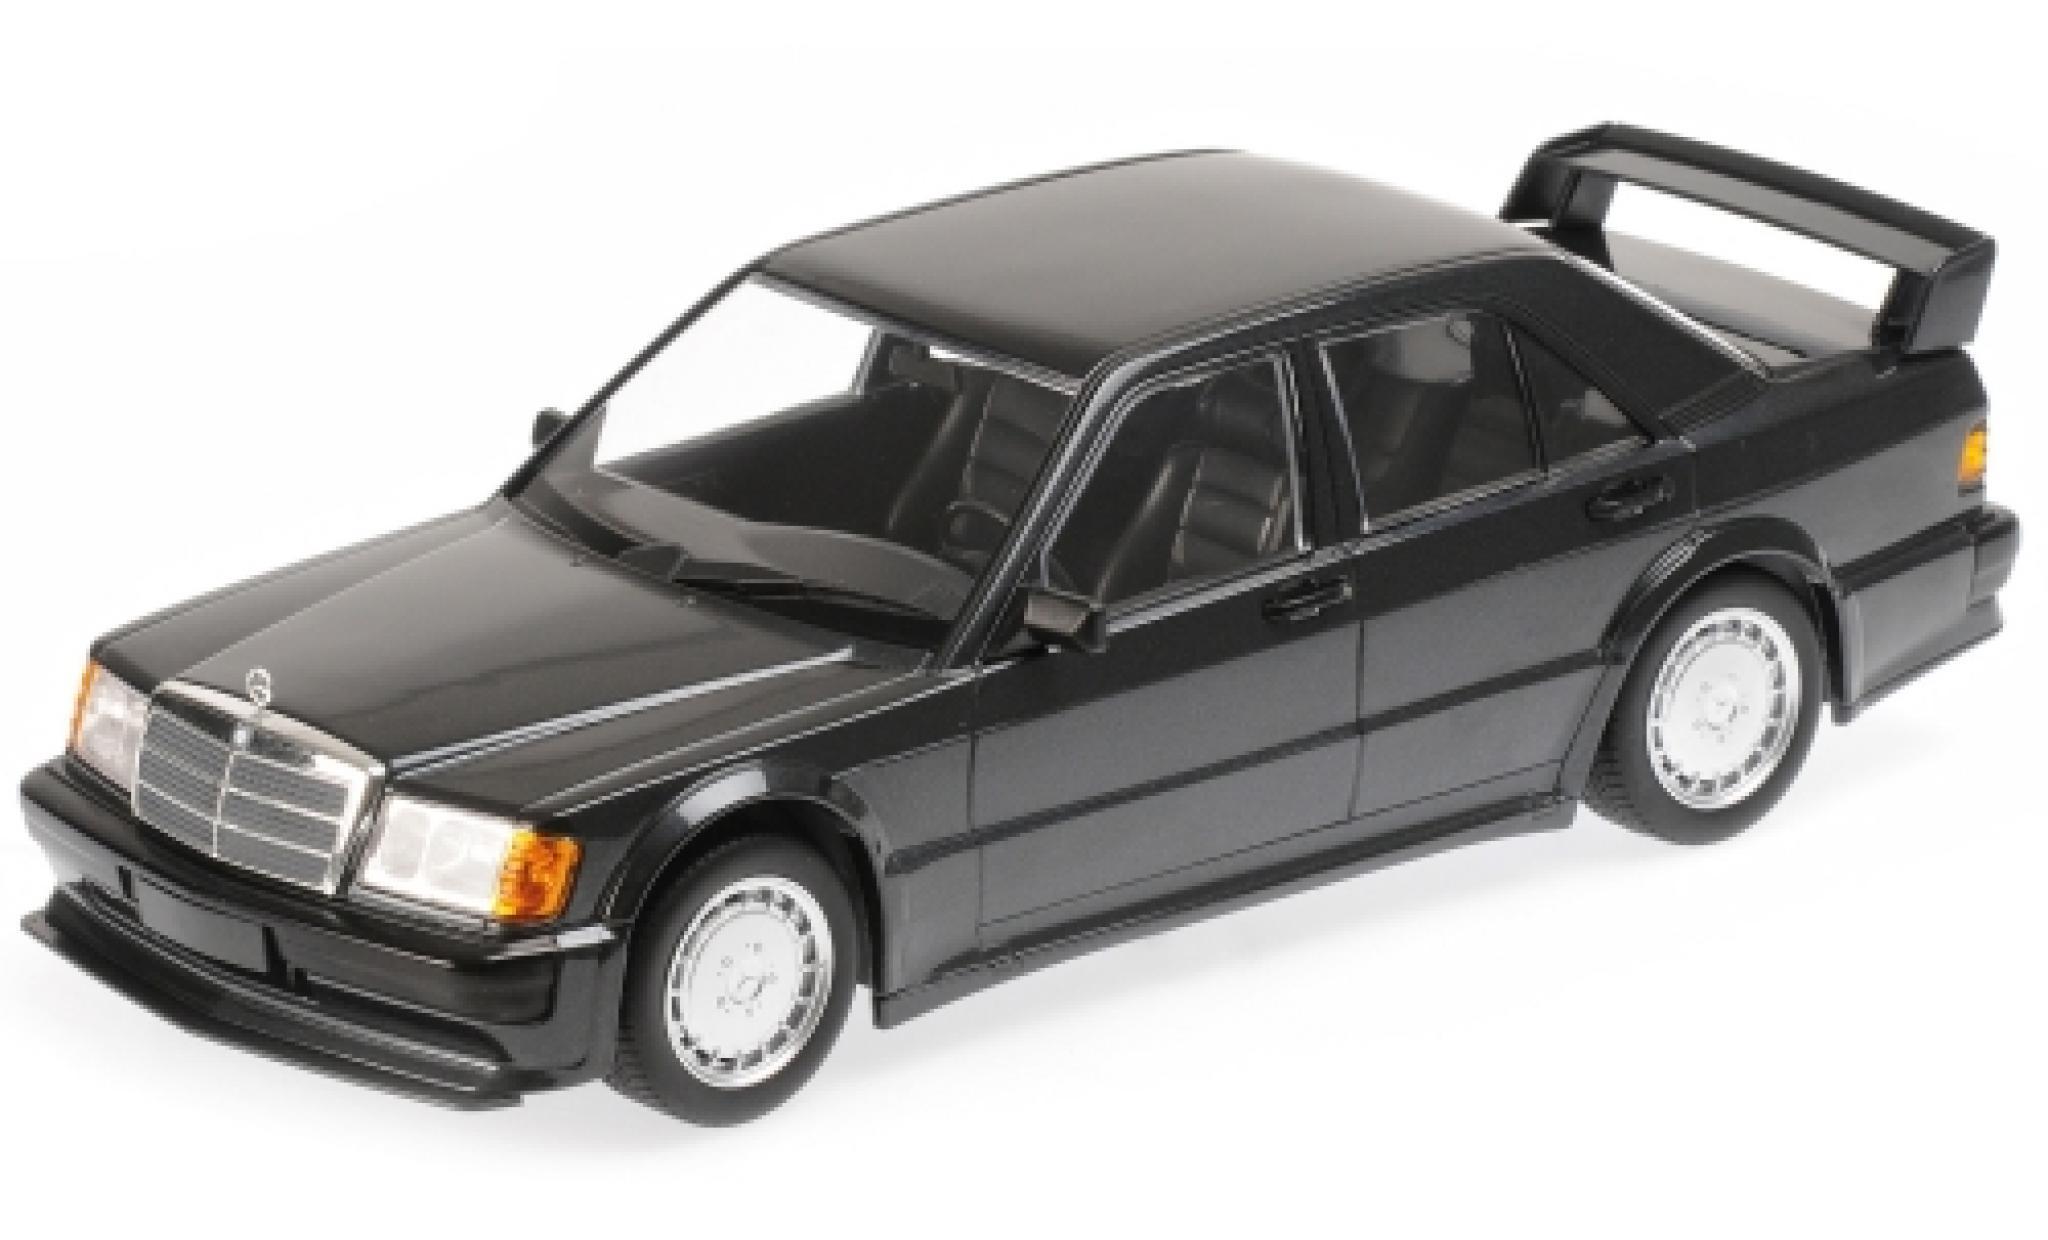 Mercedes 190 1/18 Minichamps E 2.5-16 Evo1 metallise noire 1989